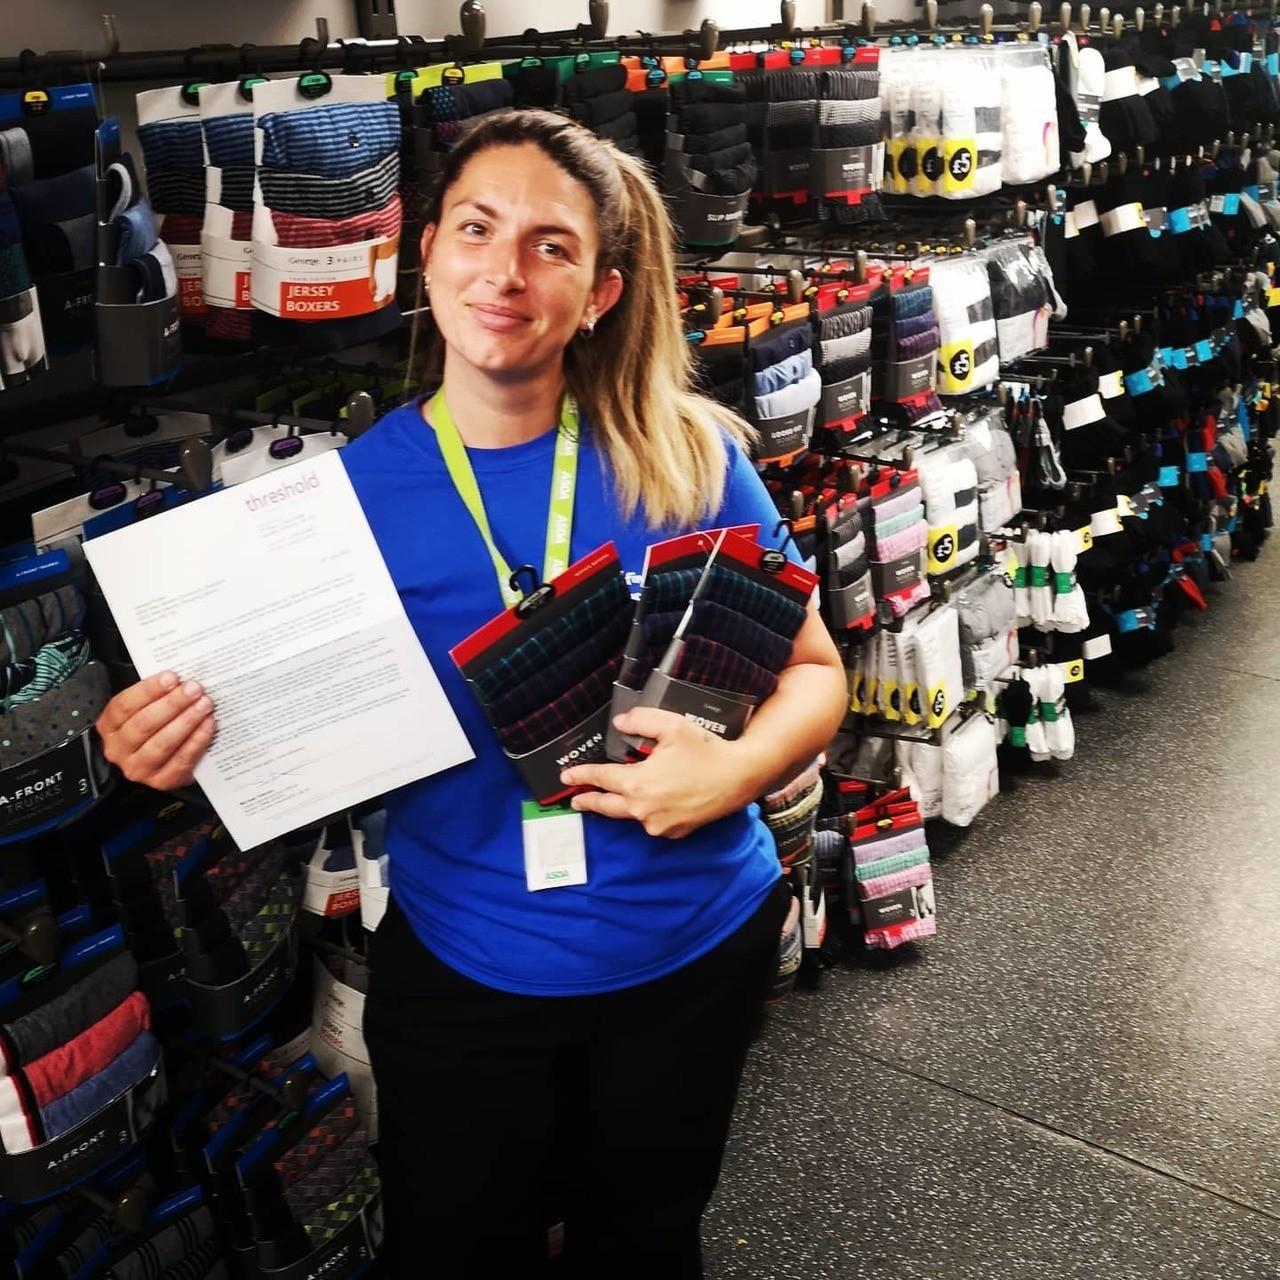 Helping homeless charity | Asda West Swindon